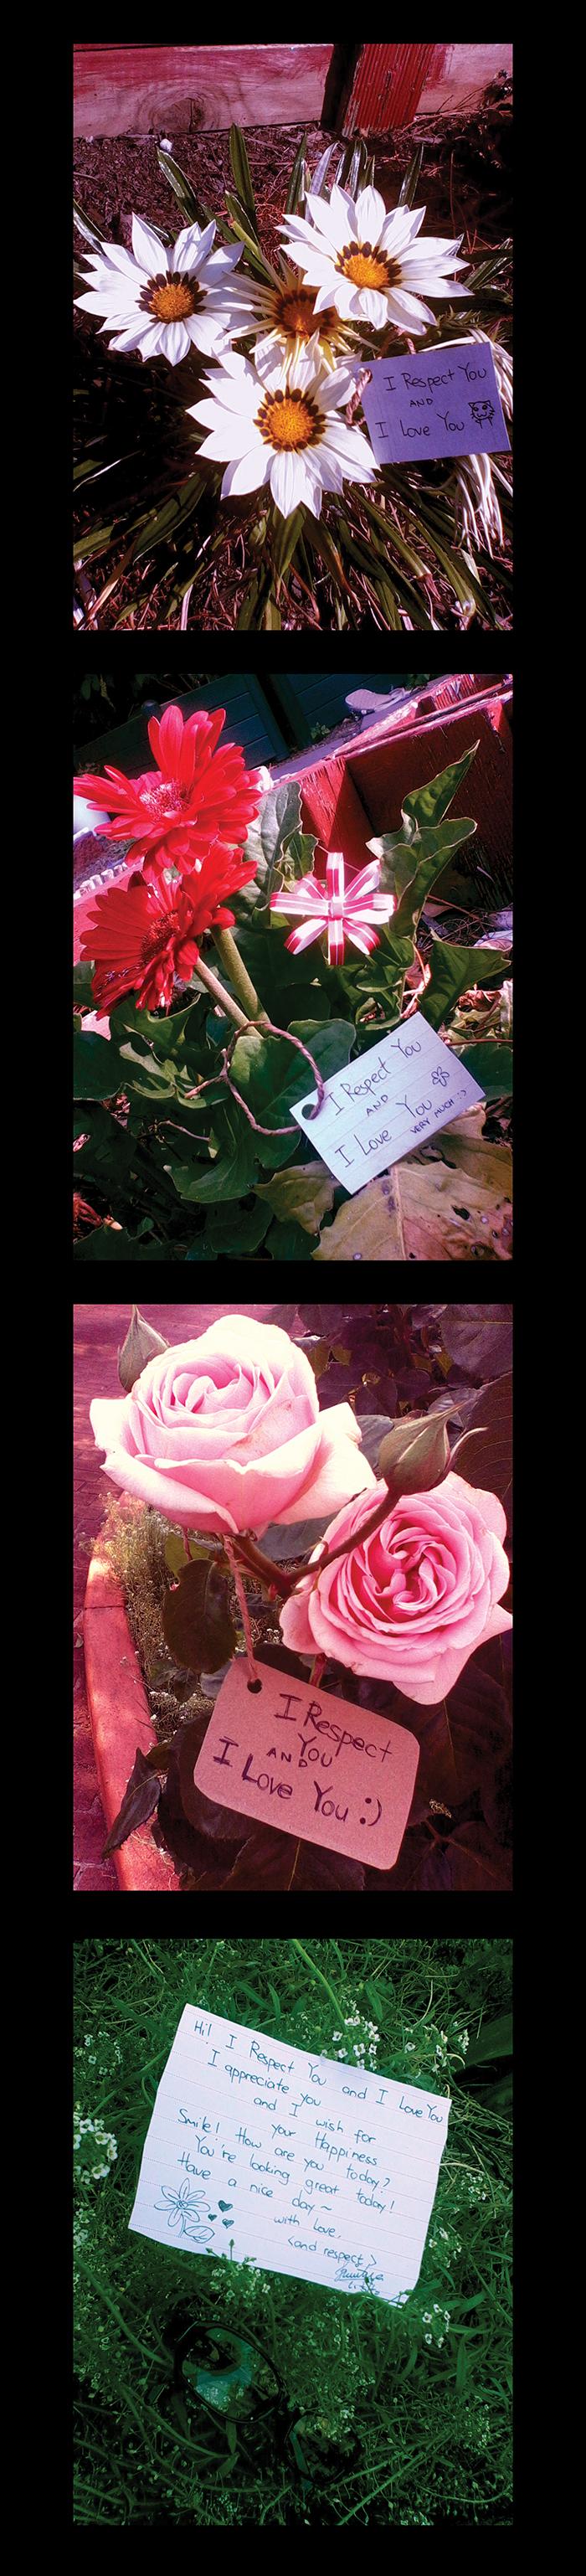 I Respect You and I Love You by IChiTa--WiYa